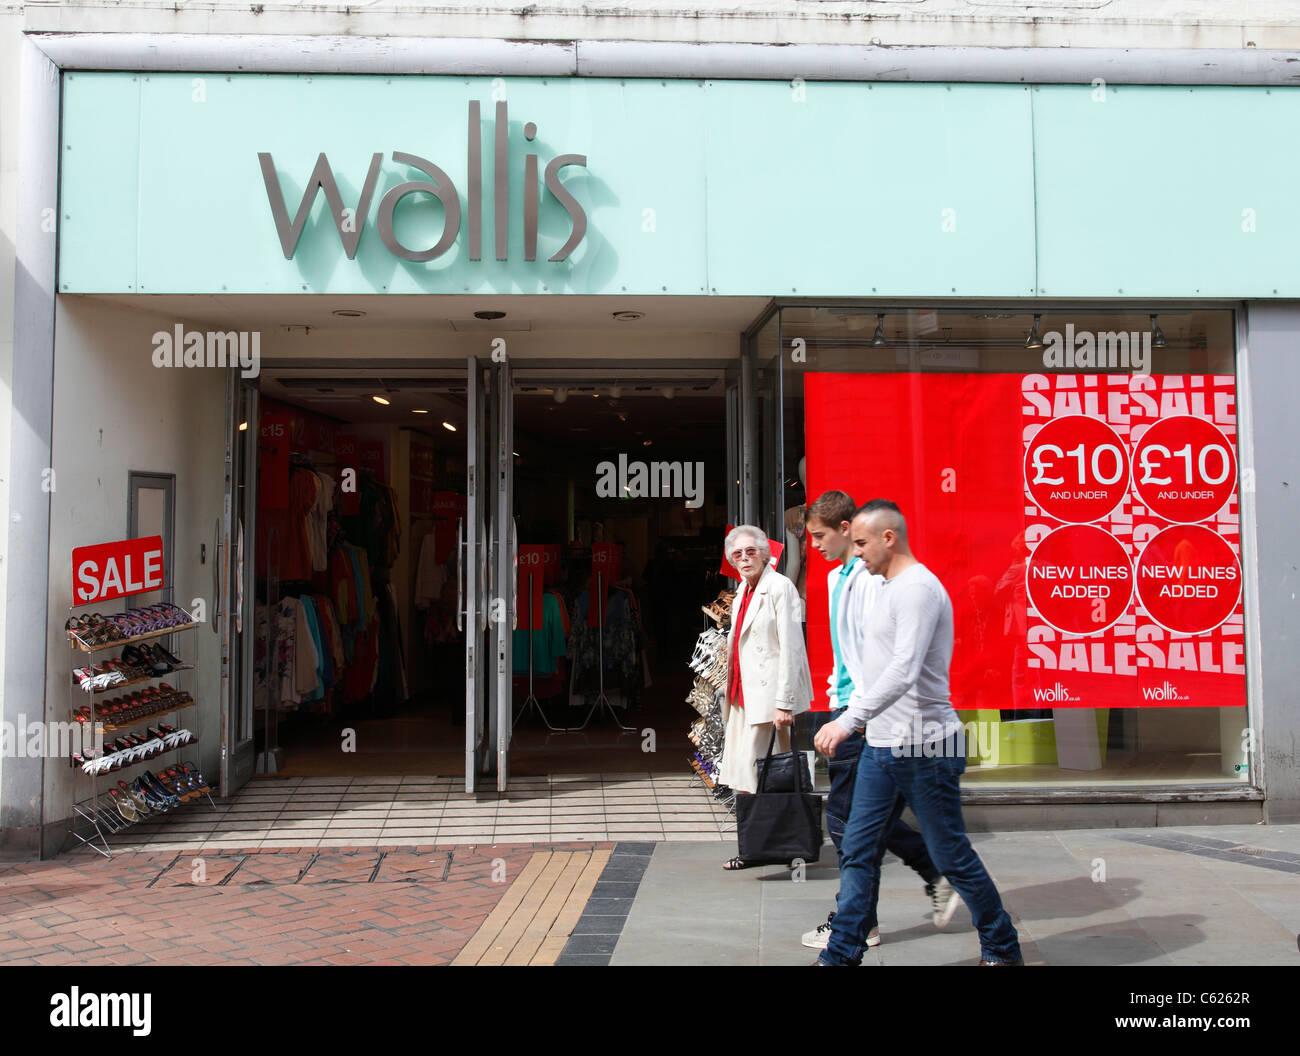 A Wallis store in Derby, England, U.K. - Stock Image